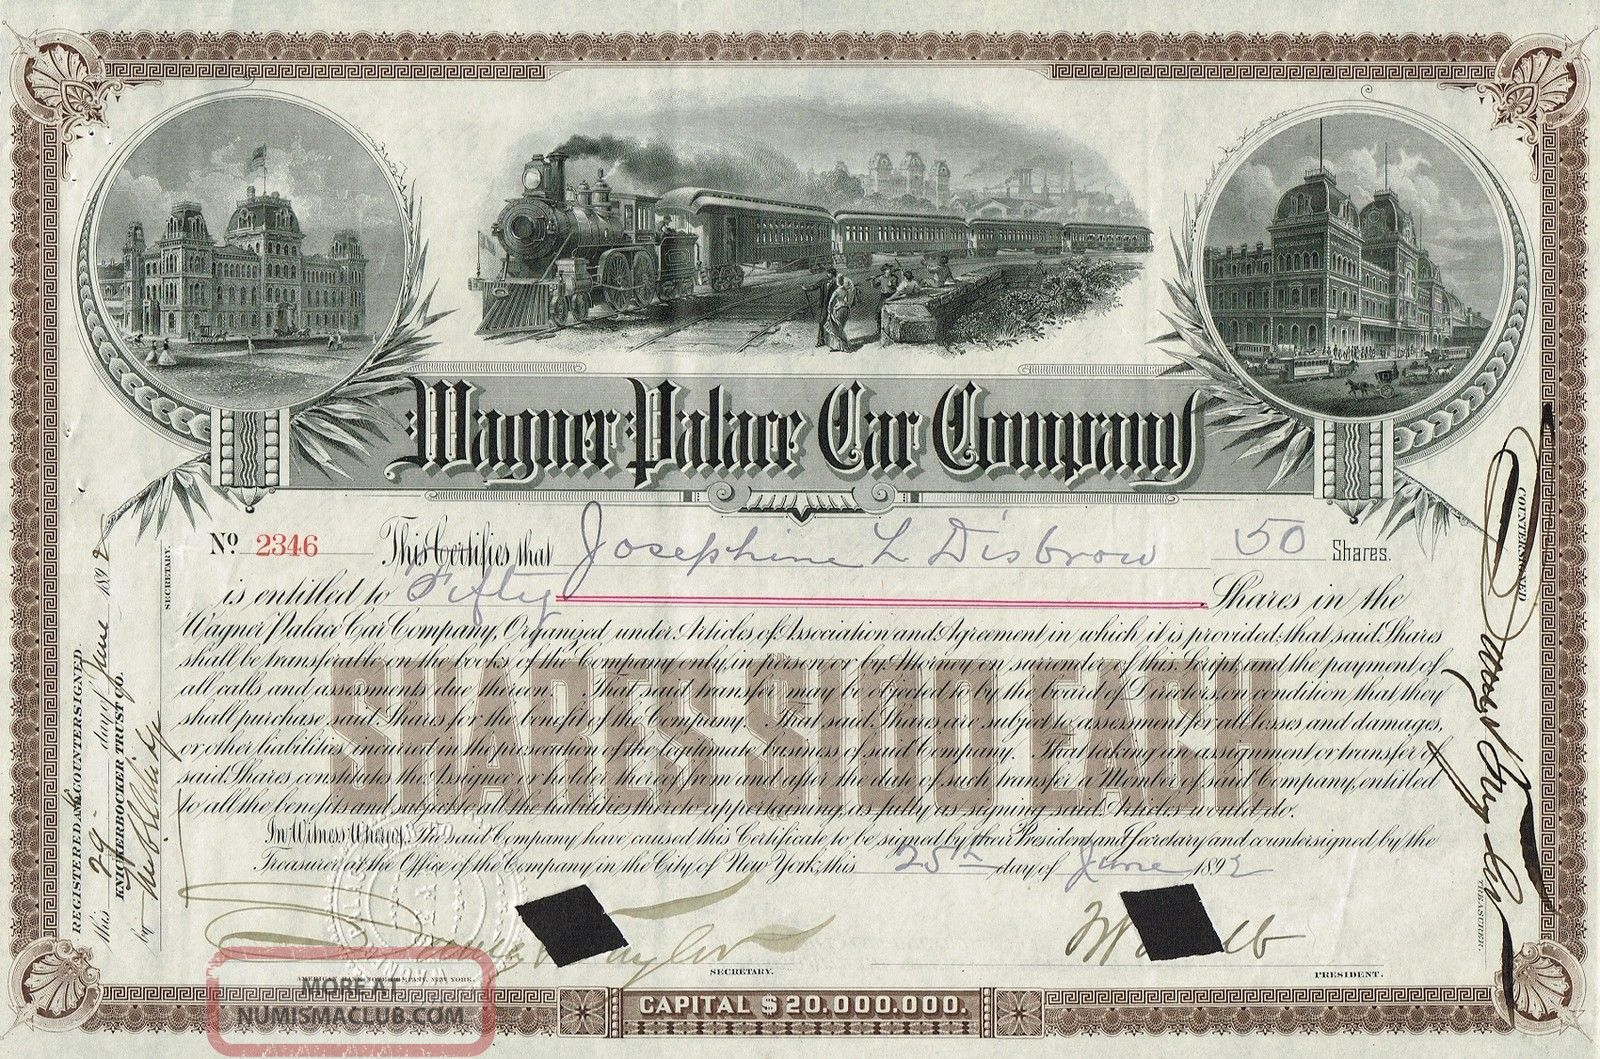 Usa Wagner Palace Car Company Stock Certificate 1892 World photo